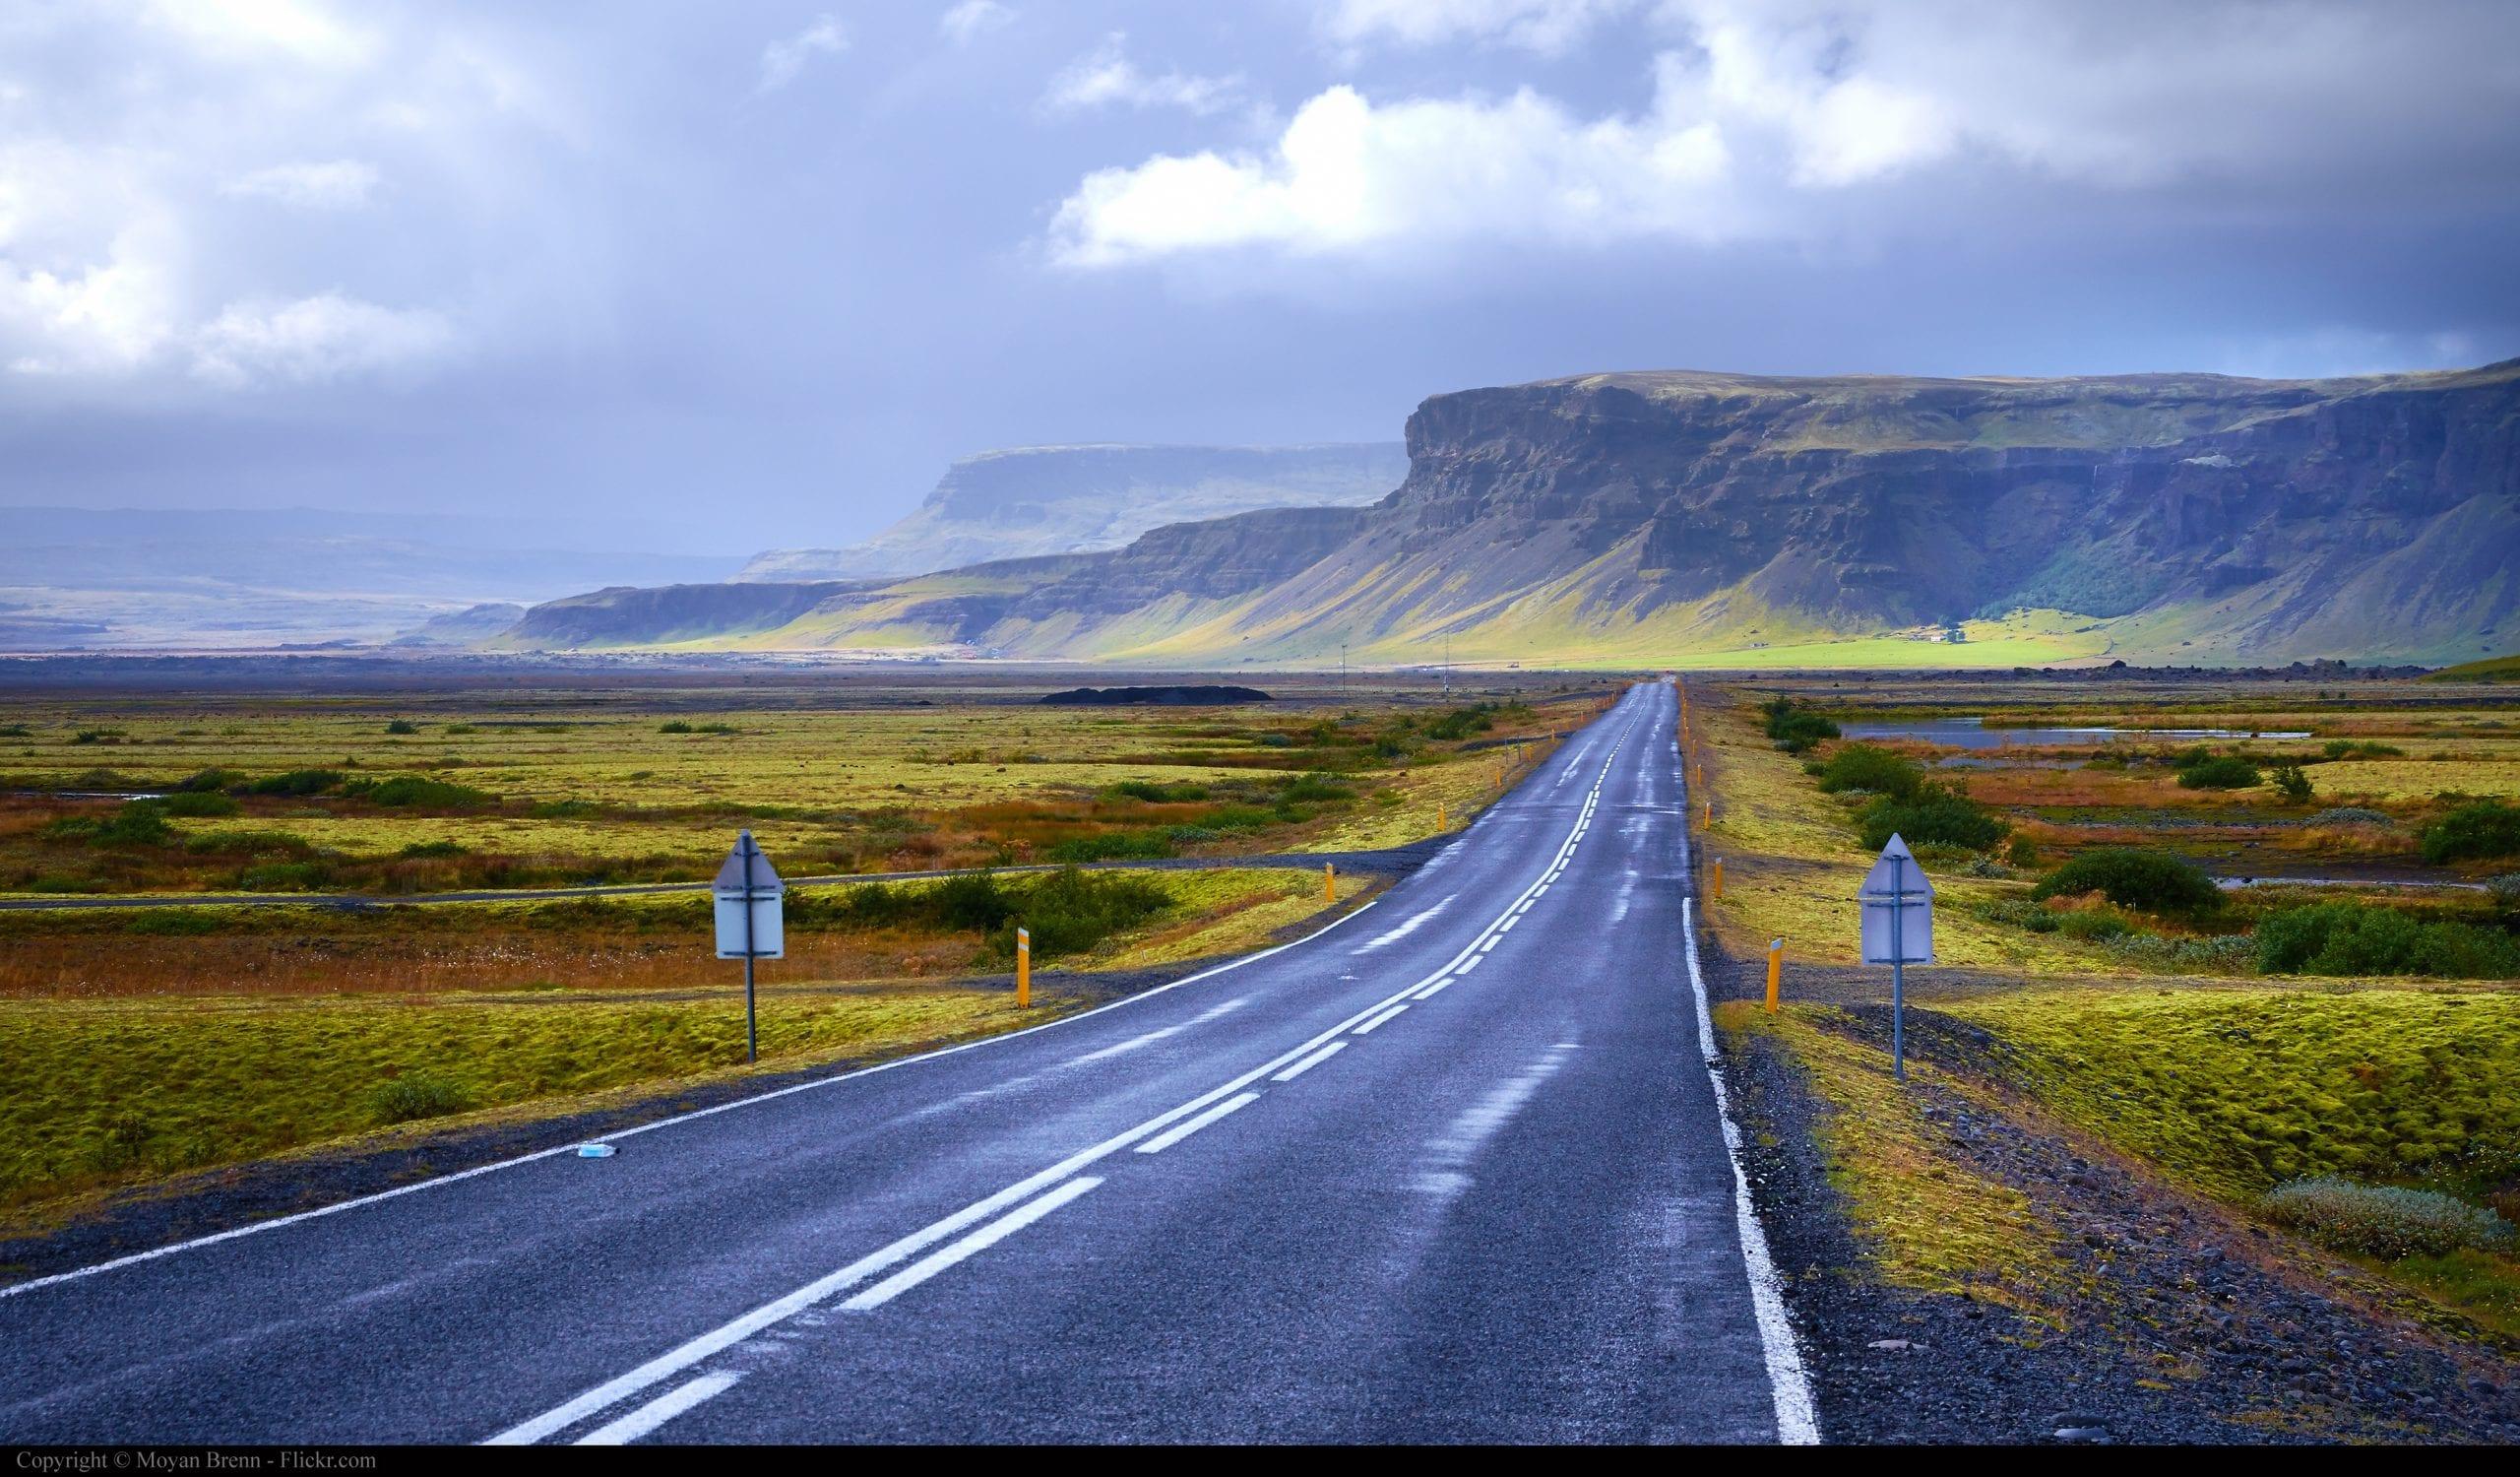 【Iceland 冰島】兩週自駕環島行程攻略 | { 把世界當教室 }